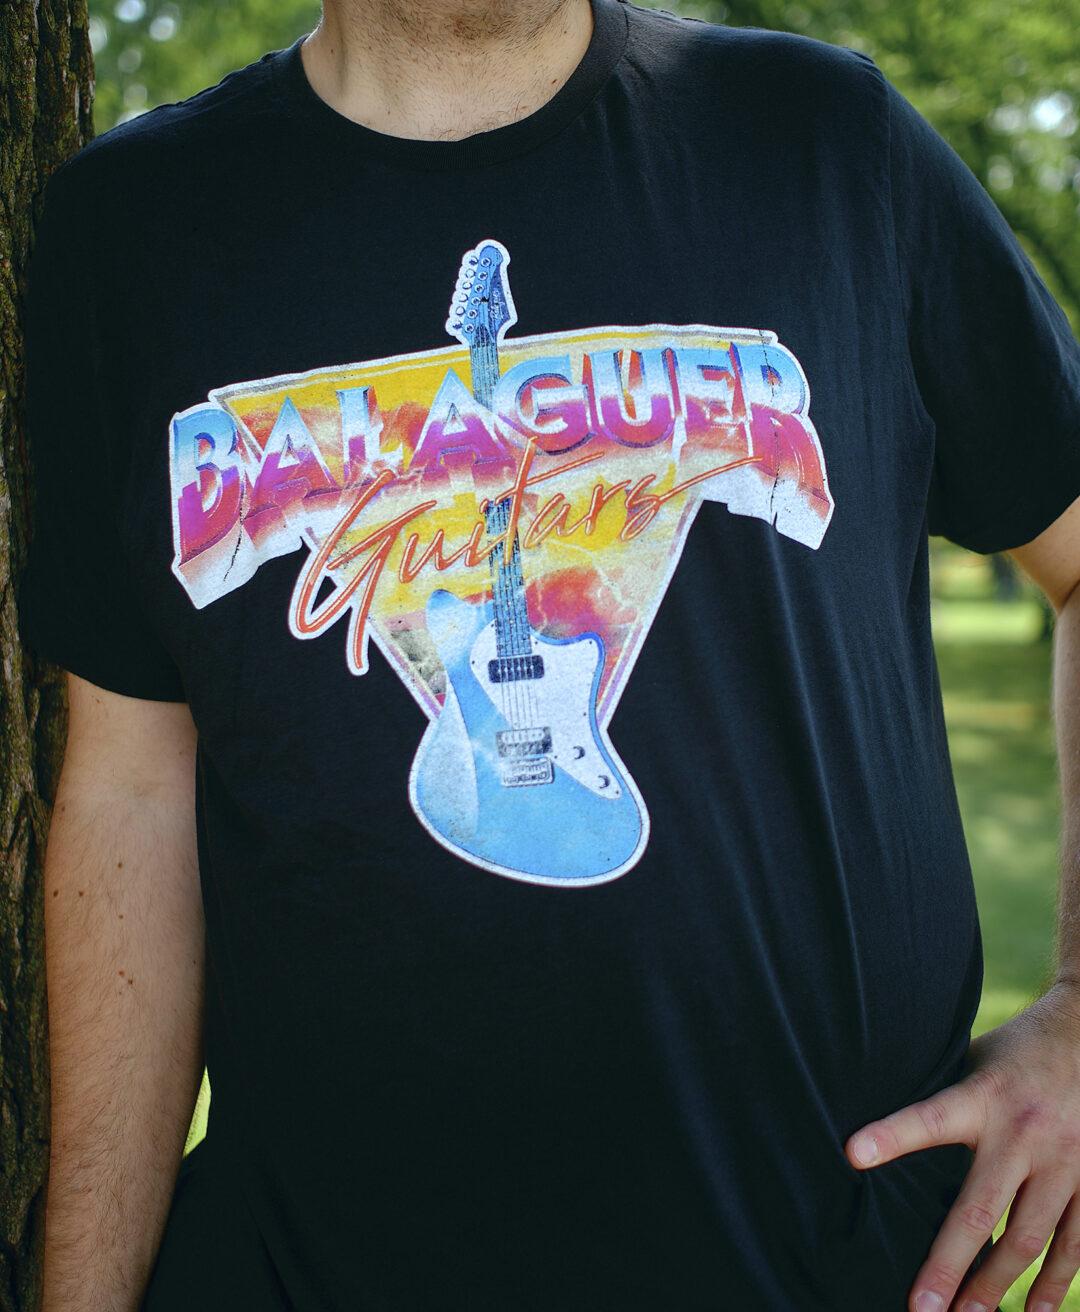 *LIMITED EDITION* Retro Balaguer Shirt